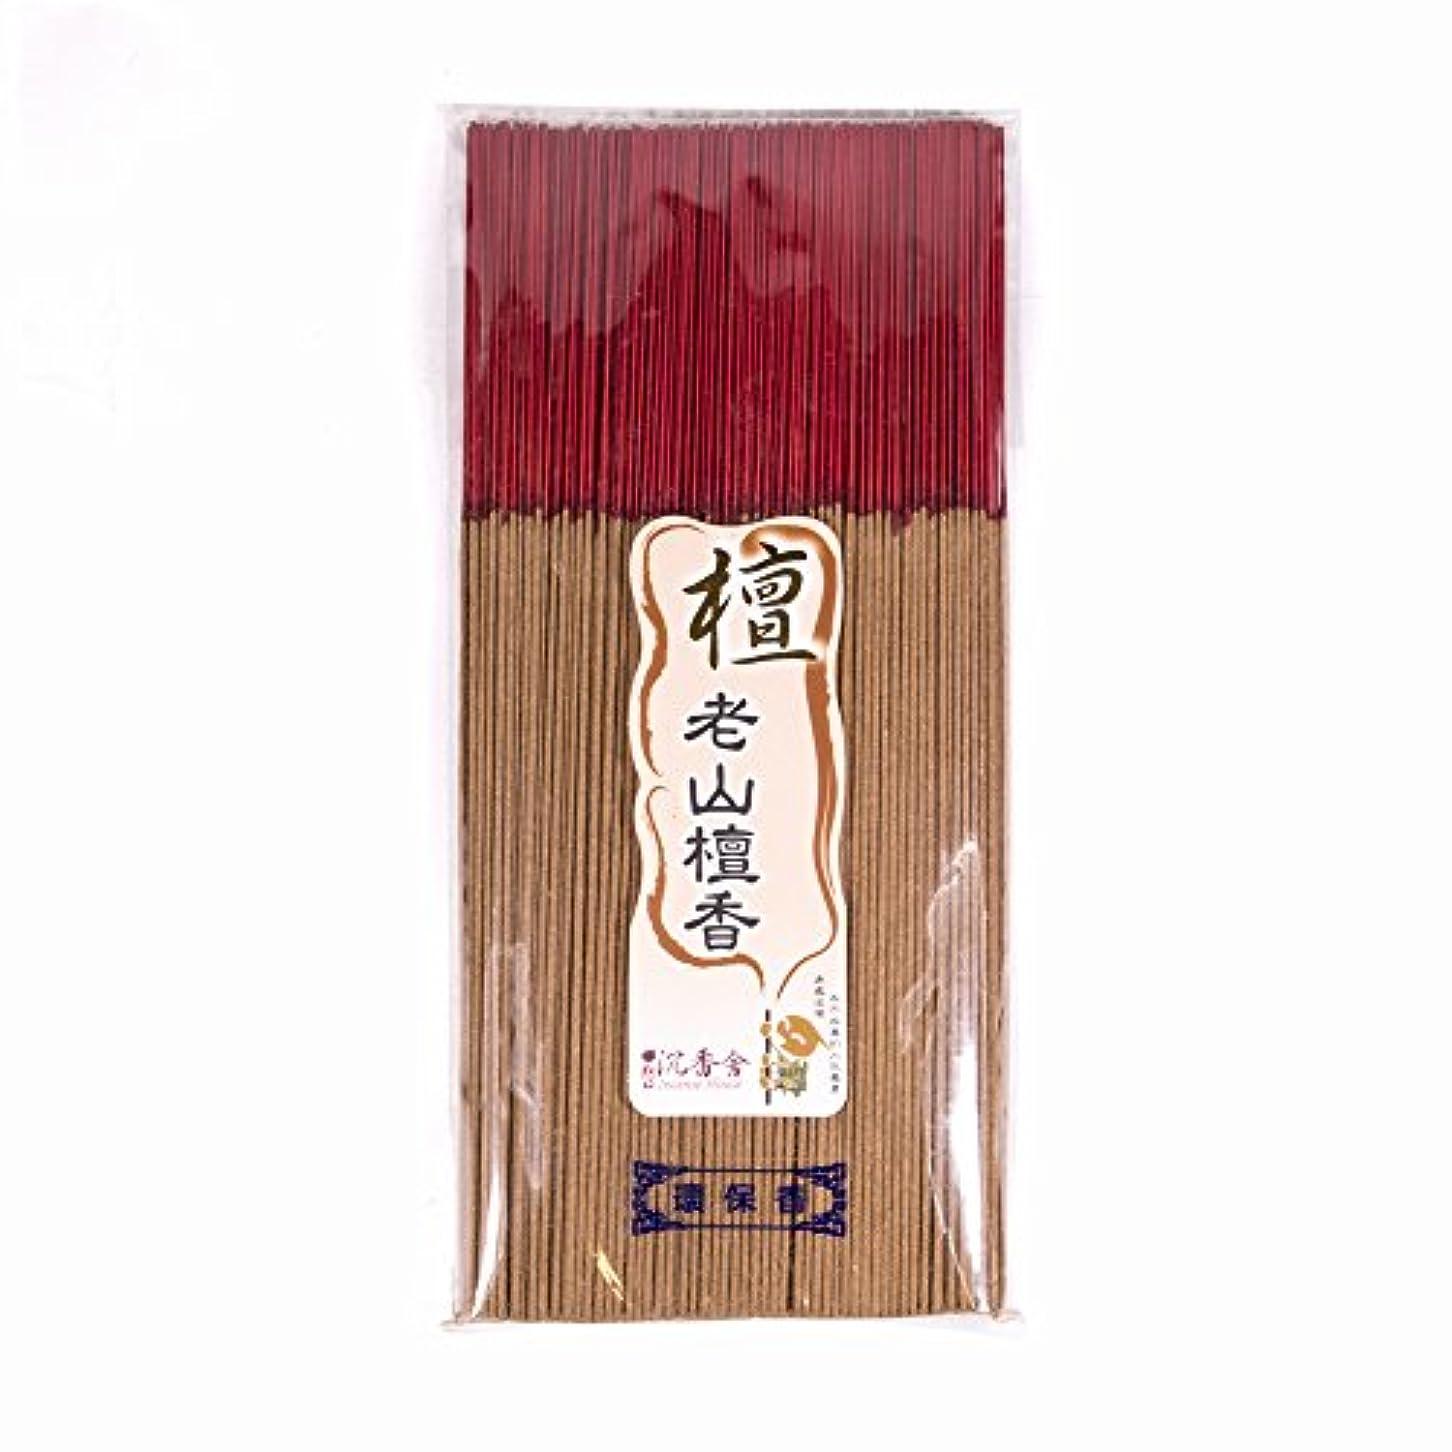 叙情的な特許オン台湾沉香舍 老山檀香 台湾のお香家 - 檀香 30cm (木支香) 300g 約400本